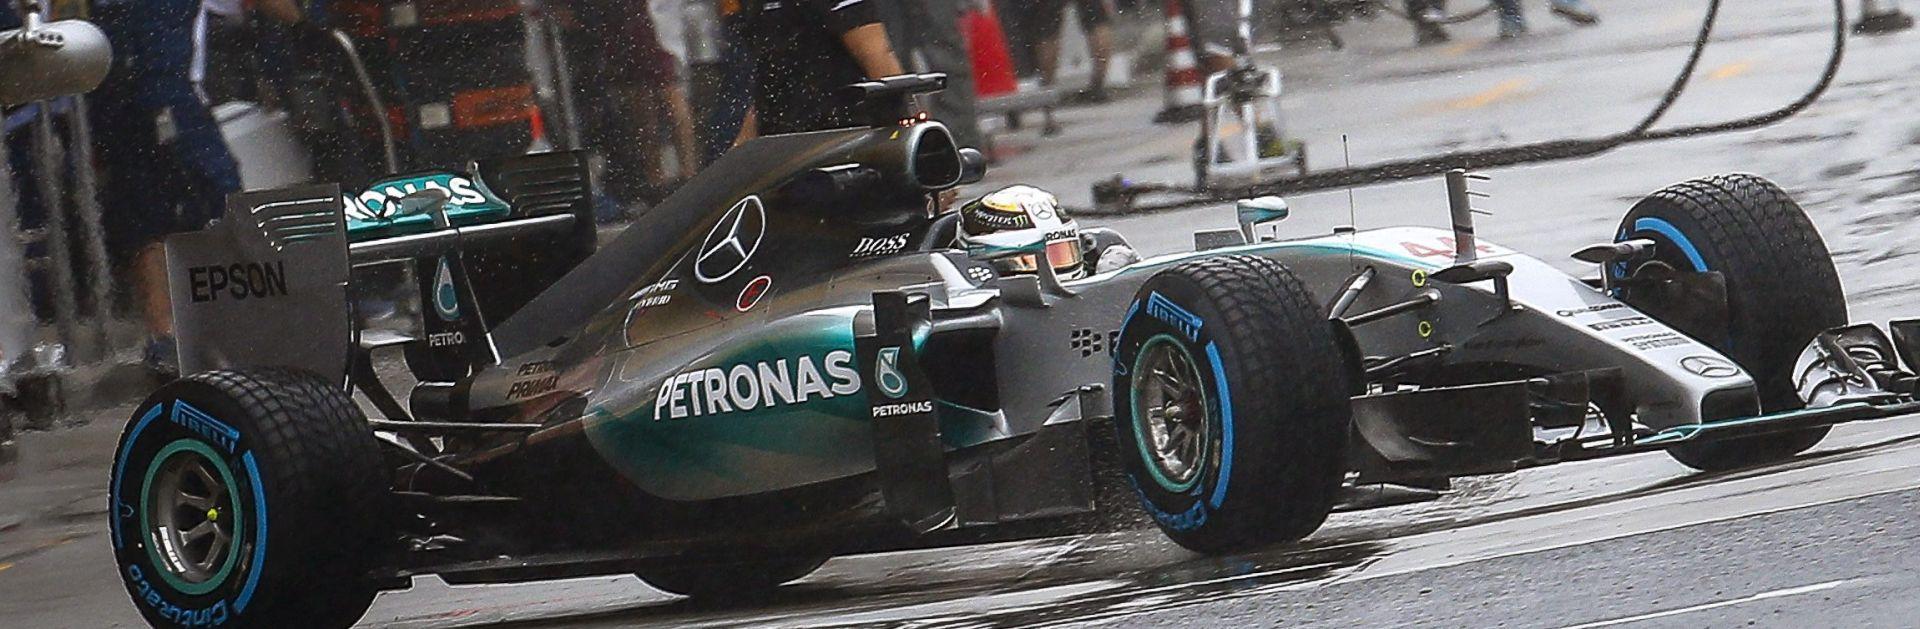 Rosbergu šesti 'pole position', Verstappen postavio rekord